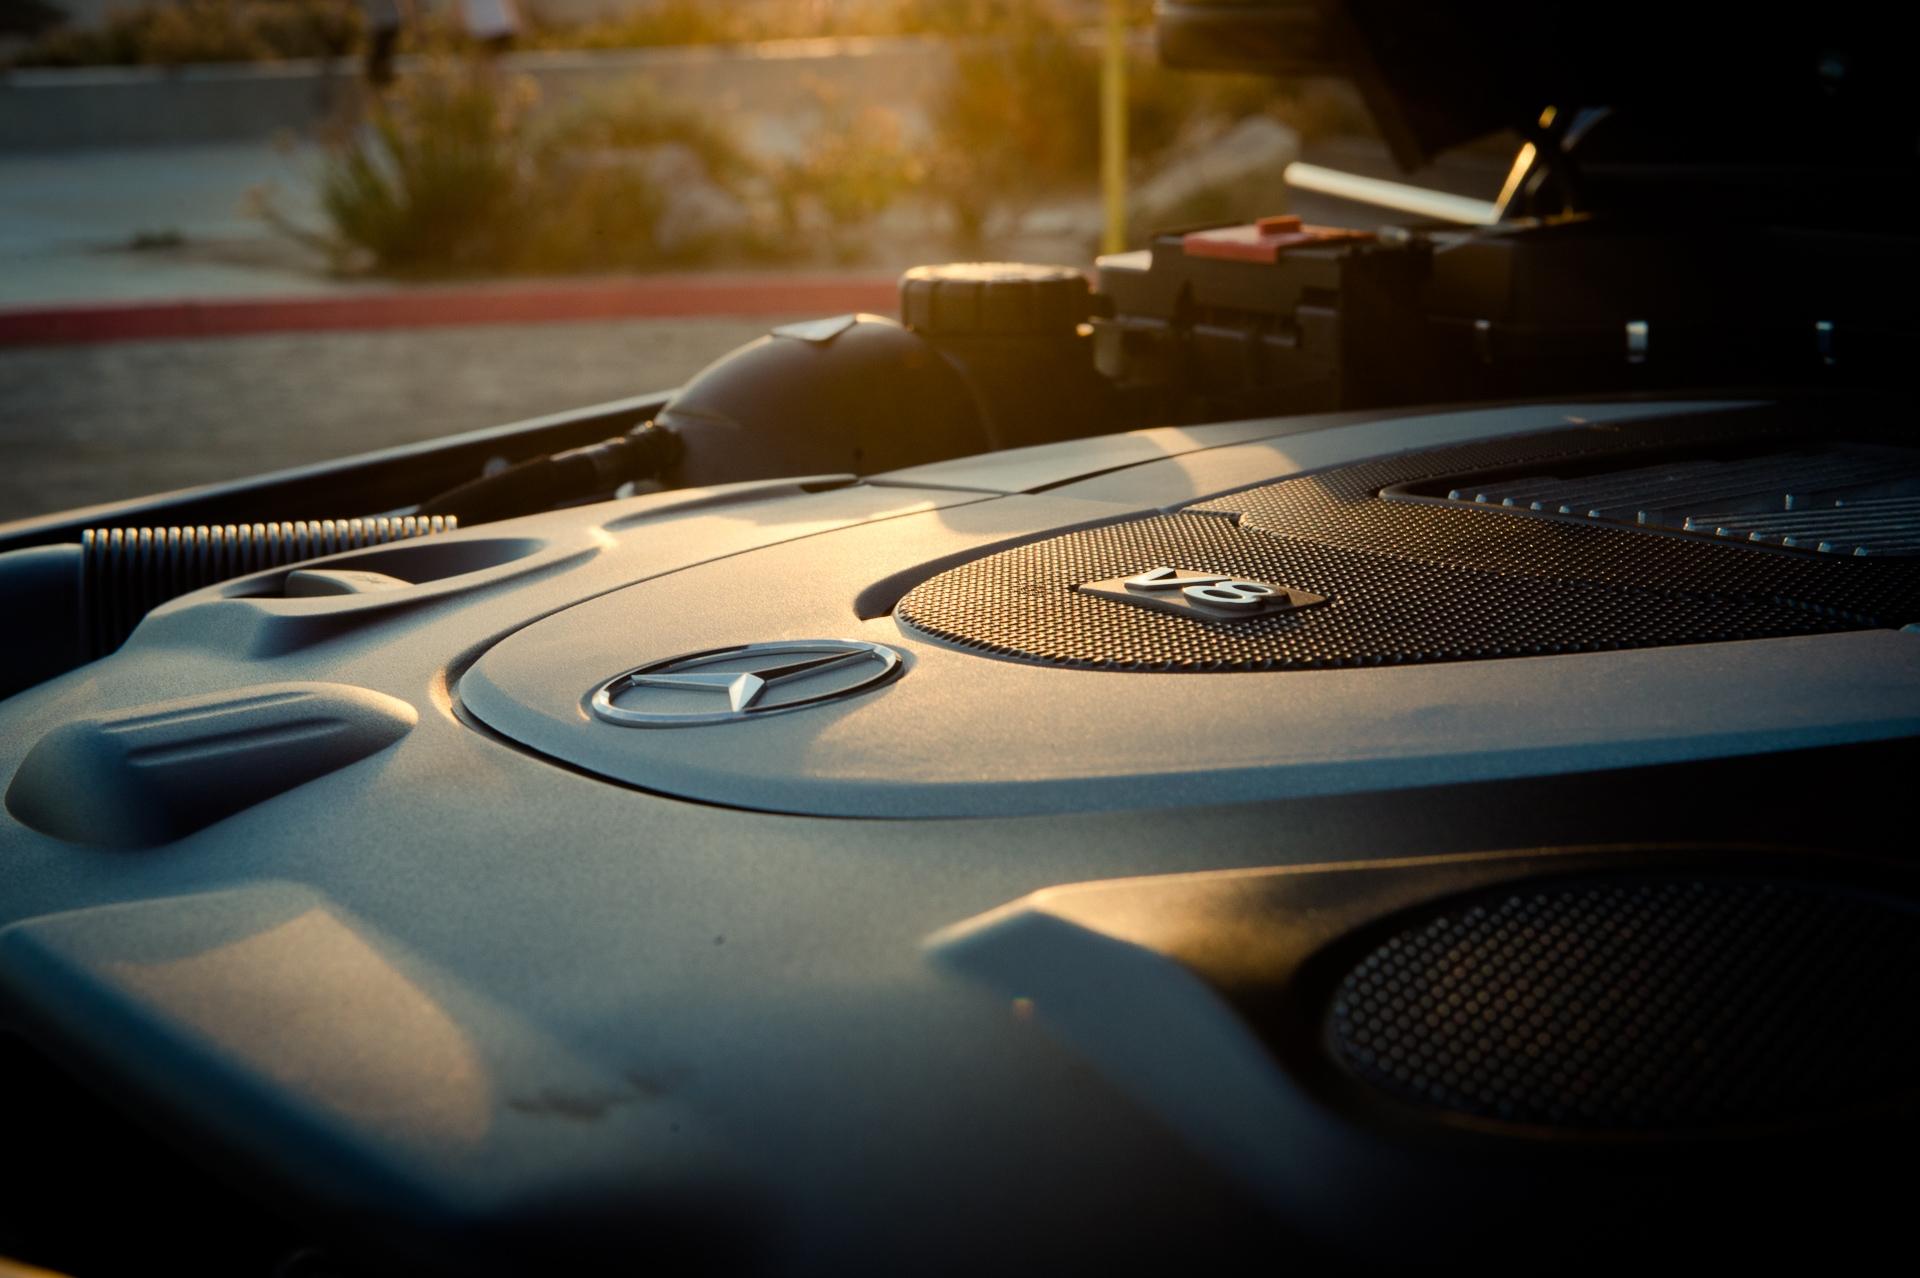 2014-Mercedes-Benz-G500-G550-braun-Kalifornien-mbrt14-50